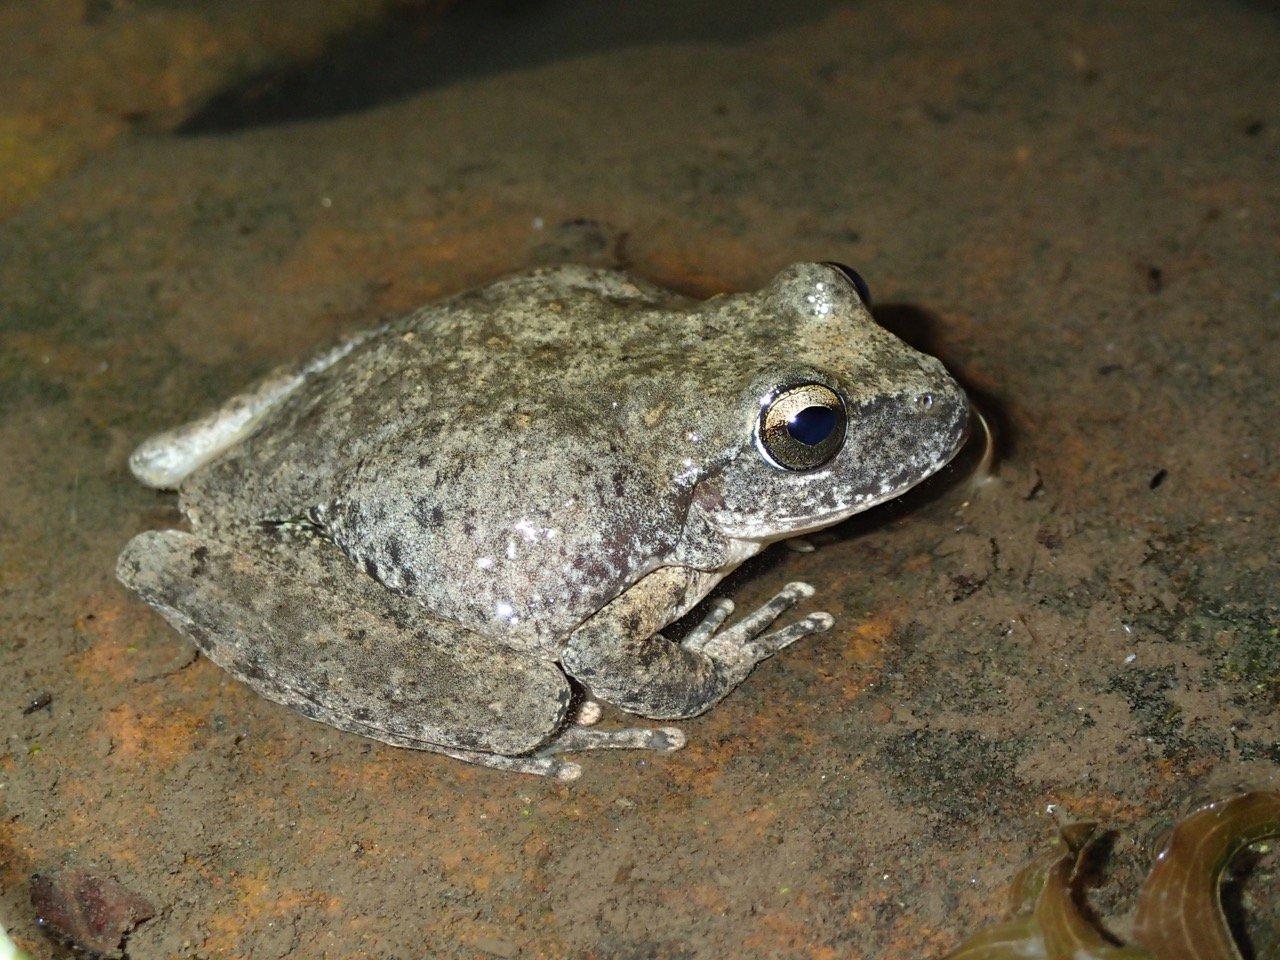 Female Booroolong Frog (Litoria booroolongensis)